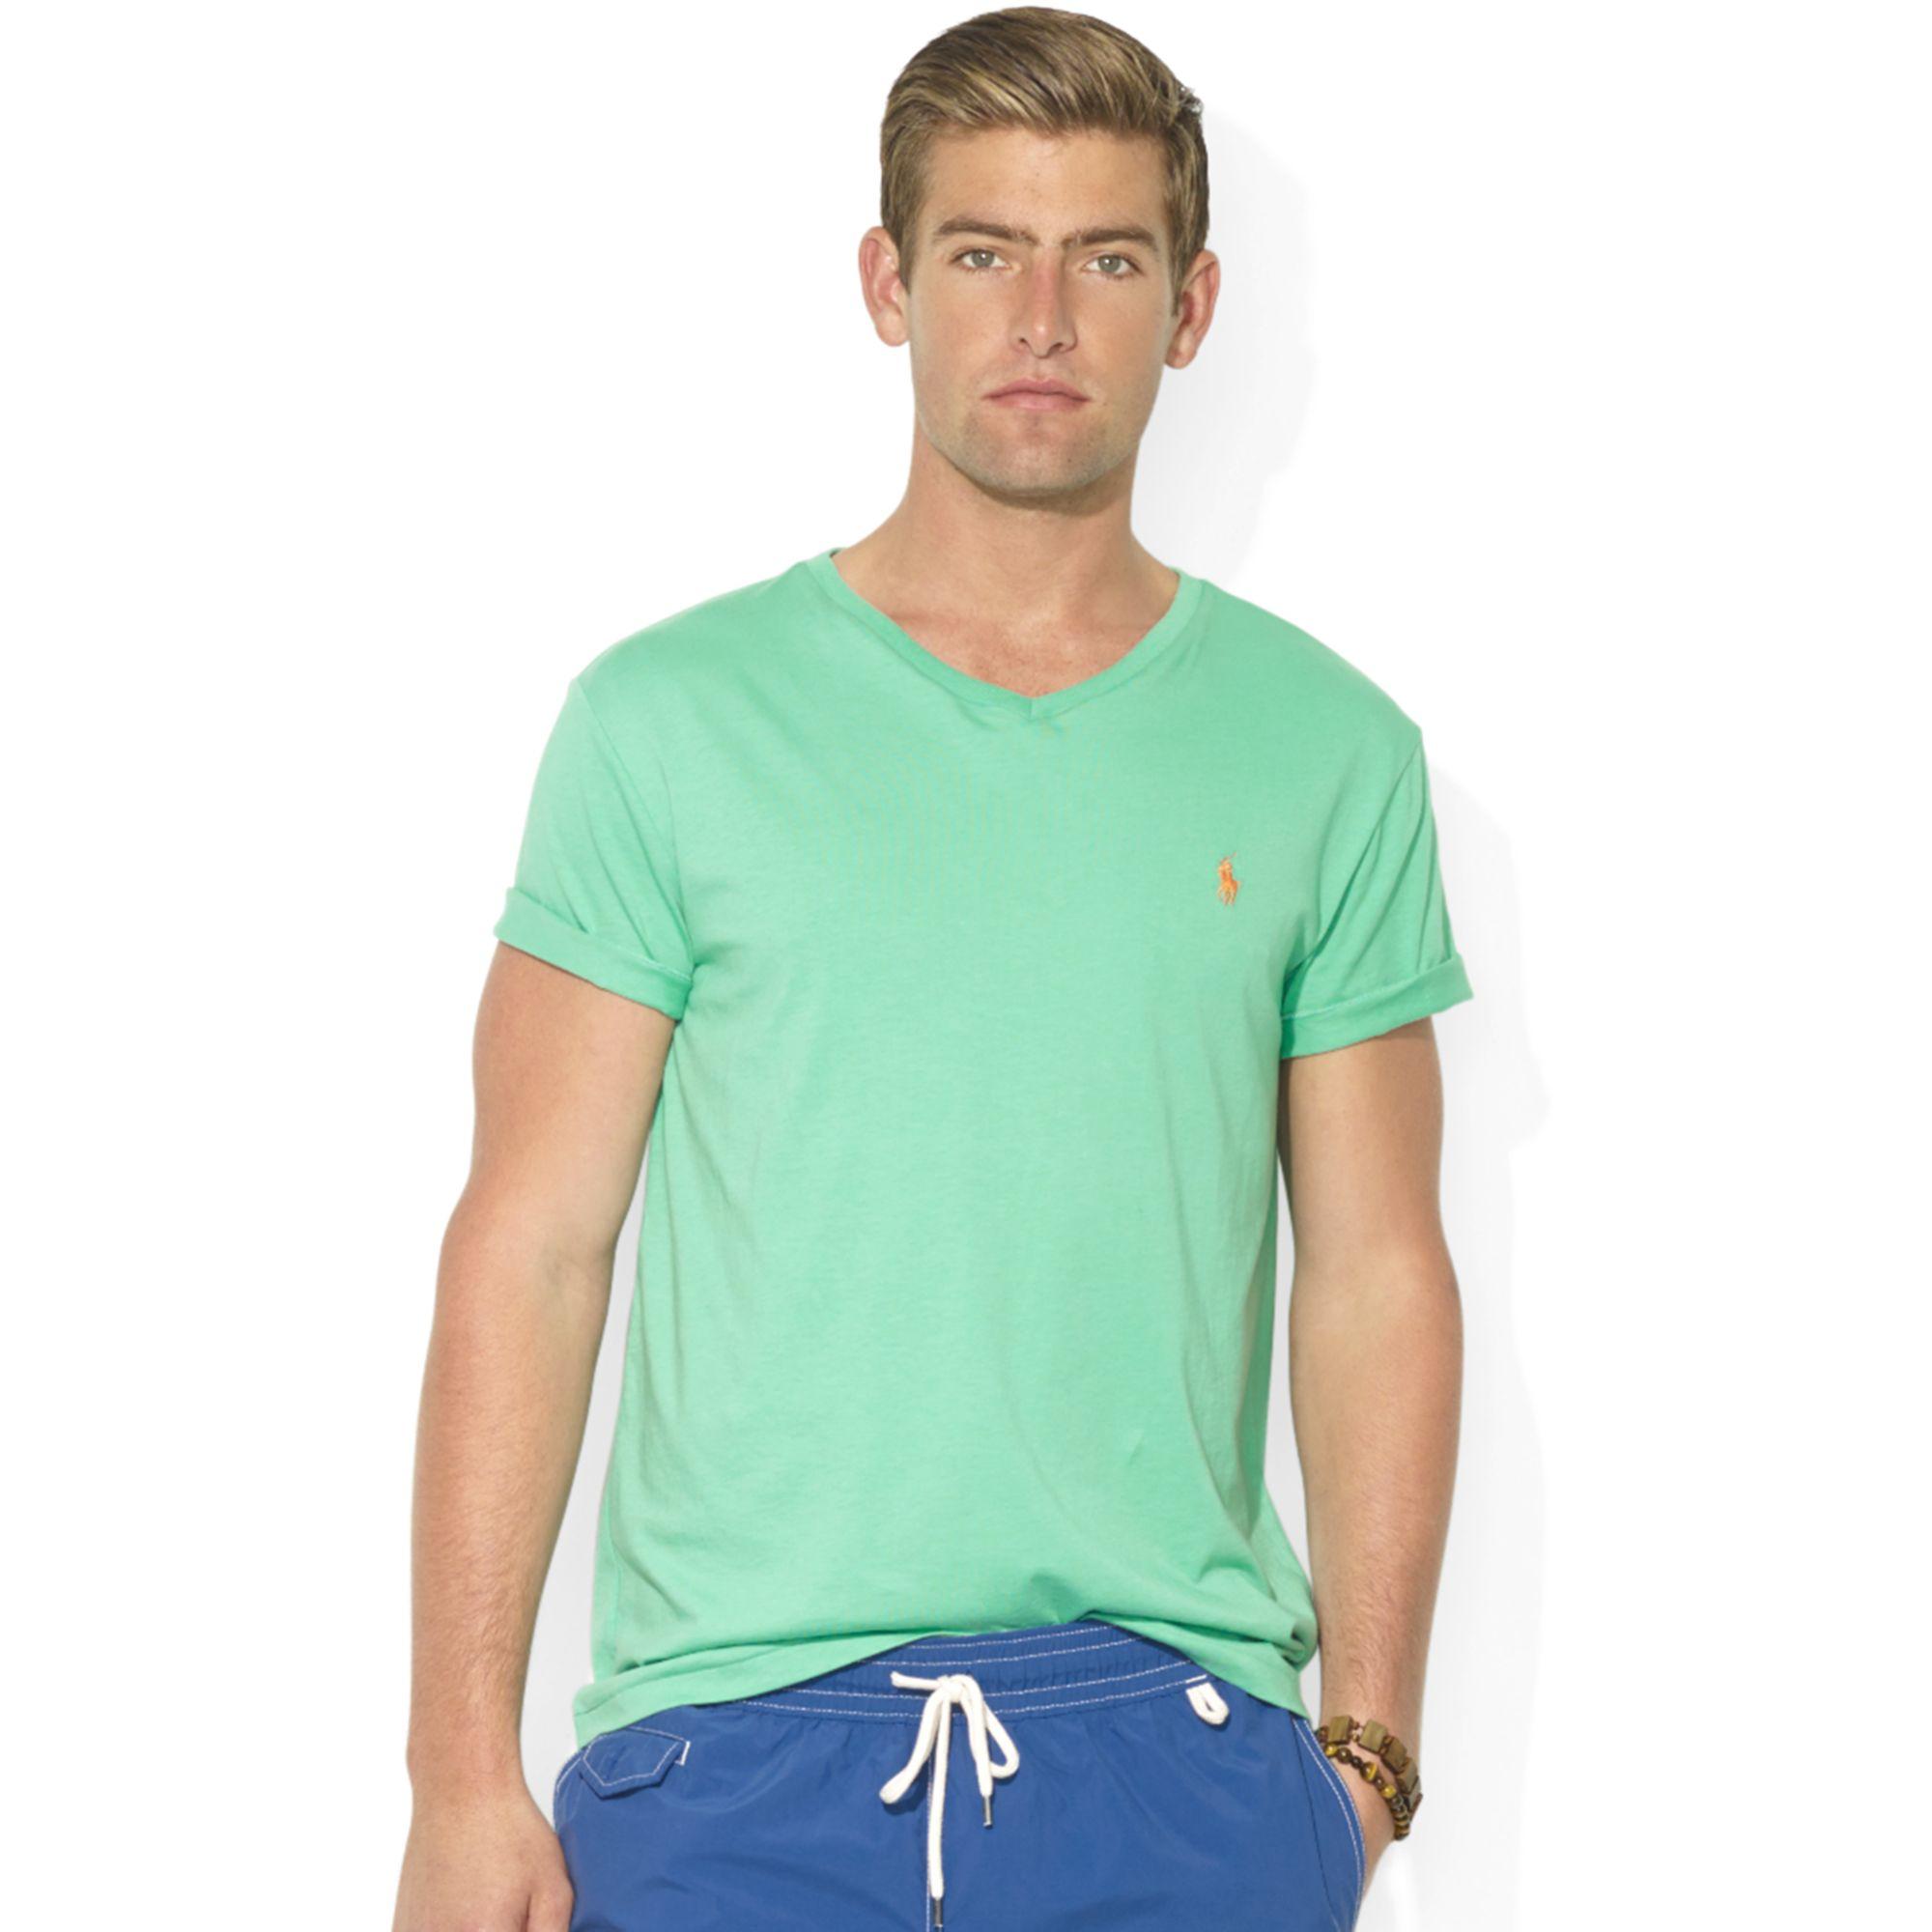 ralph lauren medium fit v neck cotton jersey t shirt in. Black Bedroom Furniture Sets. Home Design Ideas